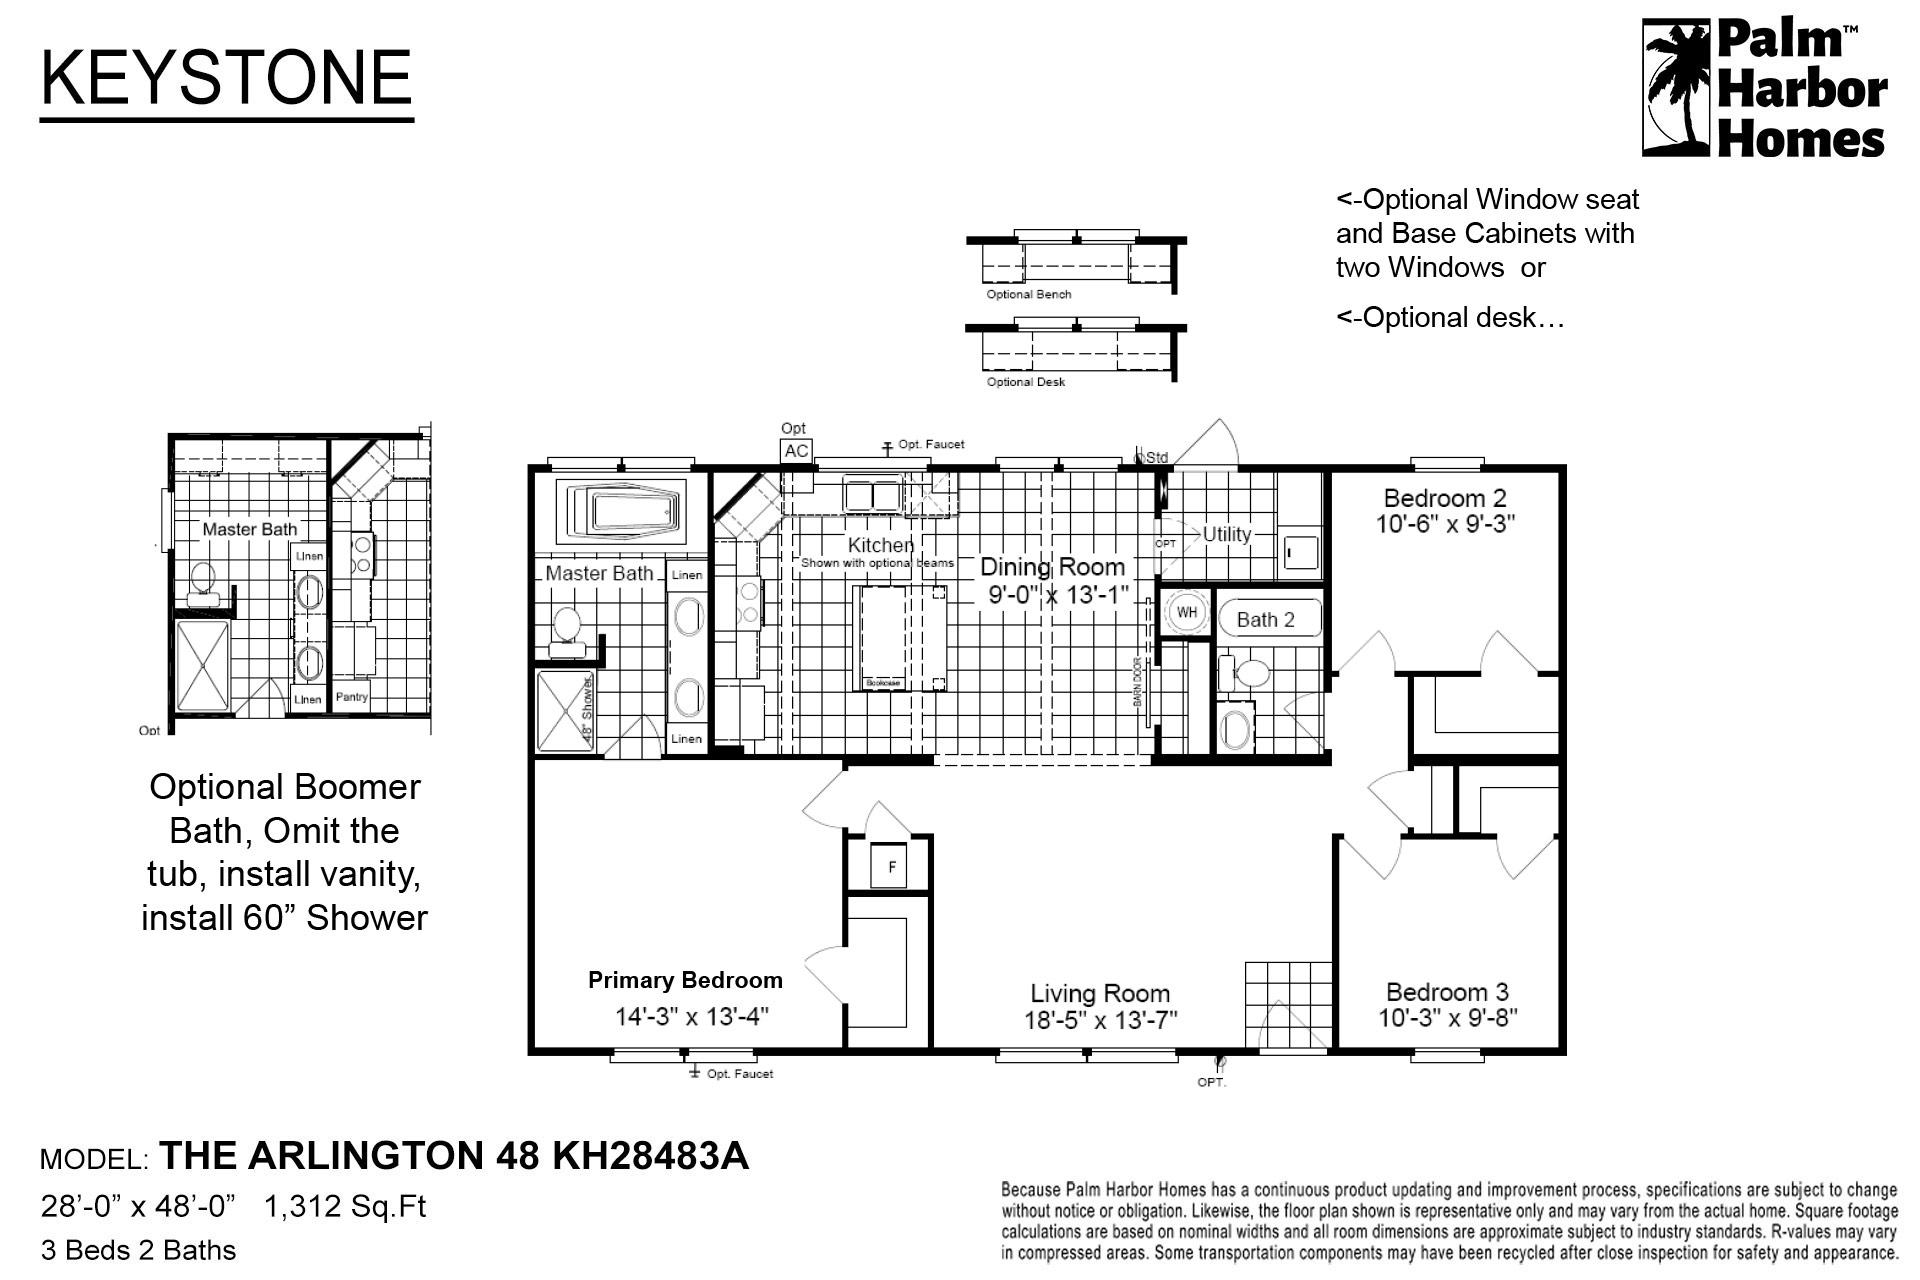 Keystone - The Arlington 48 KH28483A